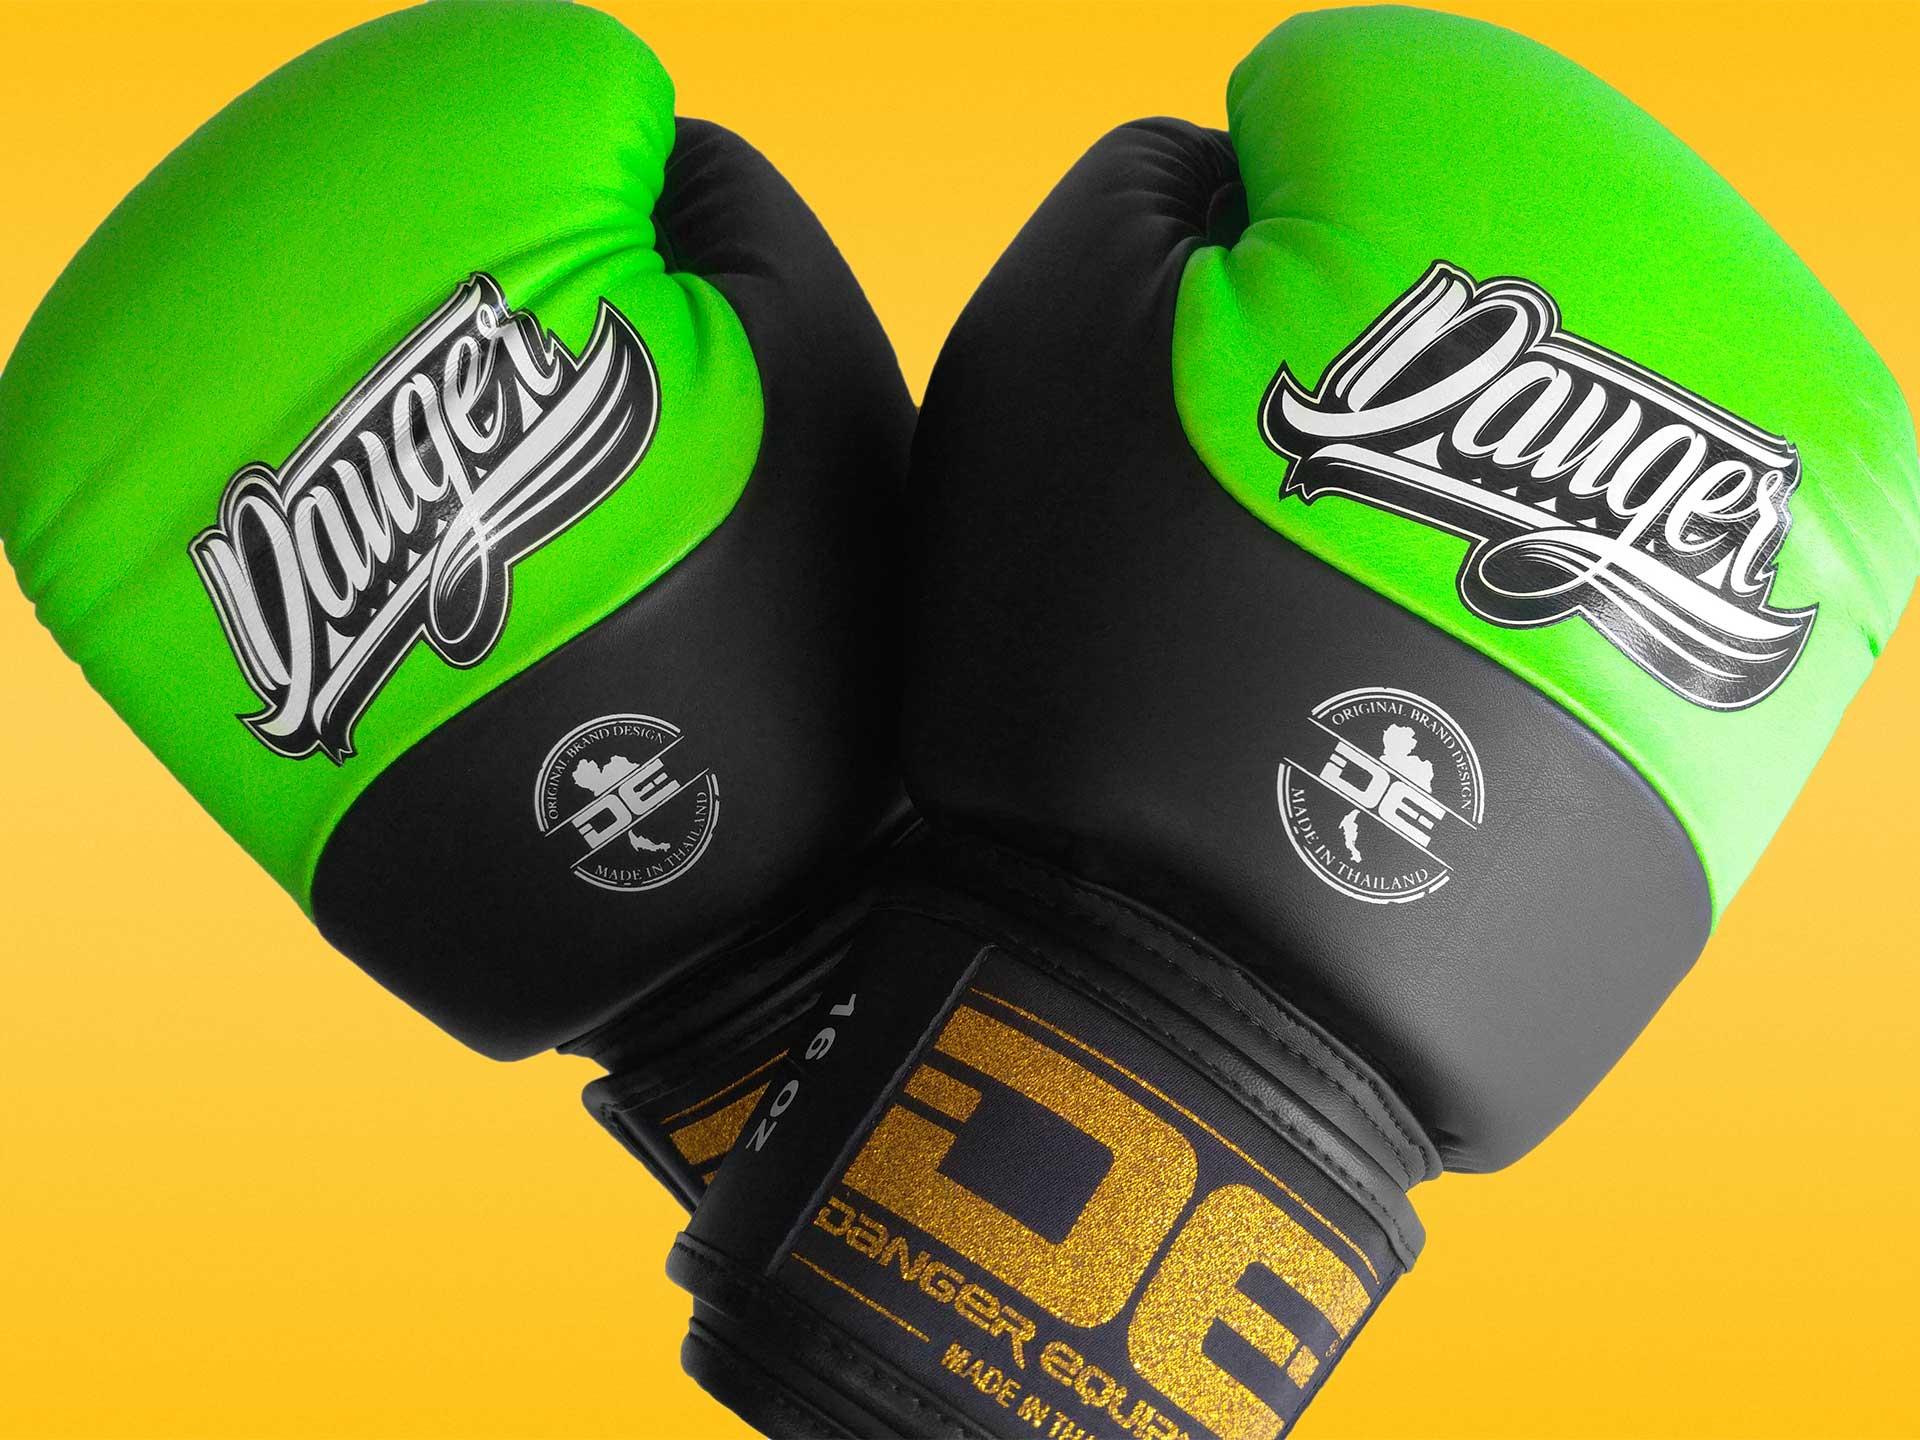 Sidekick Cobra Series Genuine Leather Boxing Gloves Sparring Fight Gloves Sizes